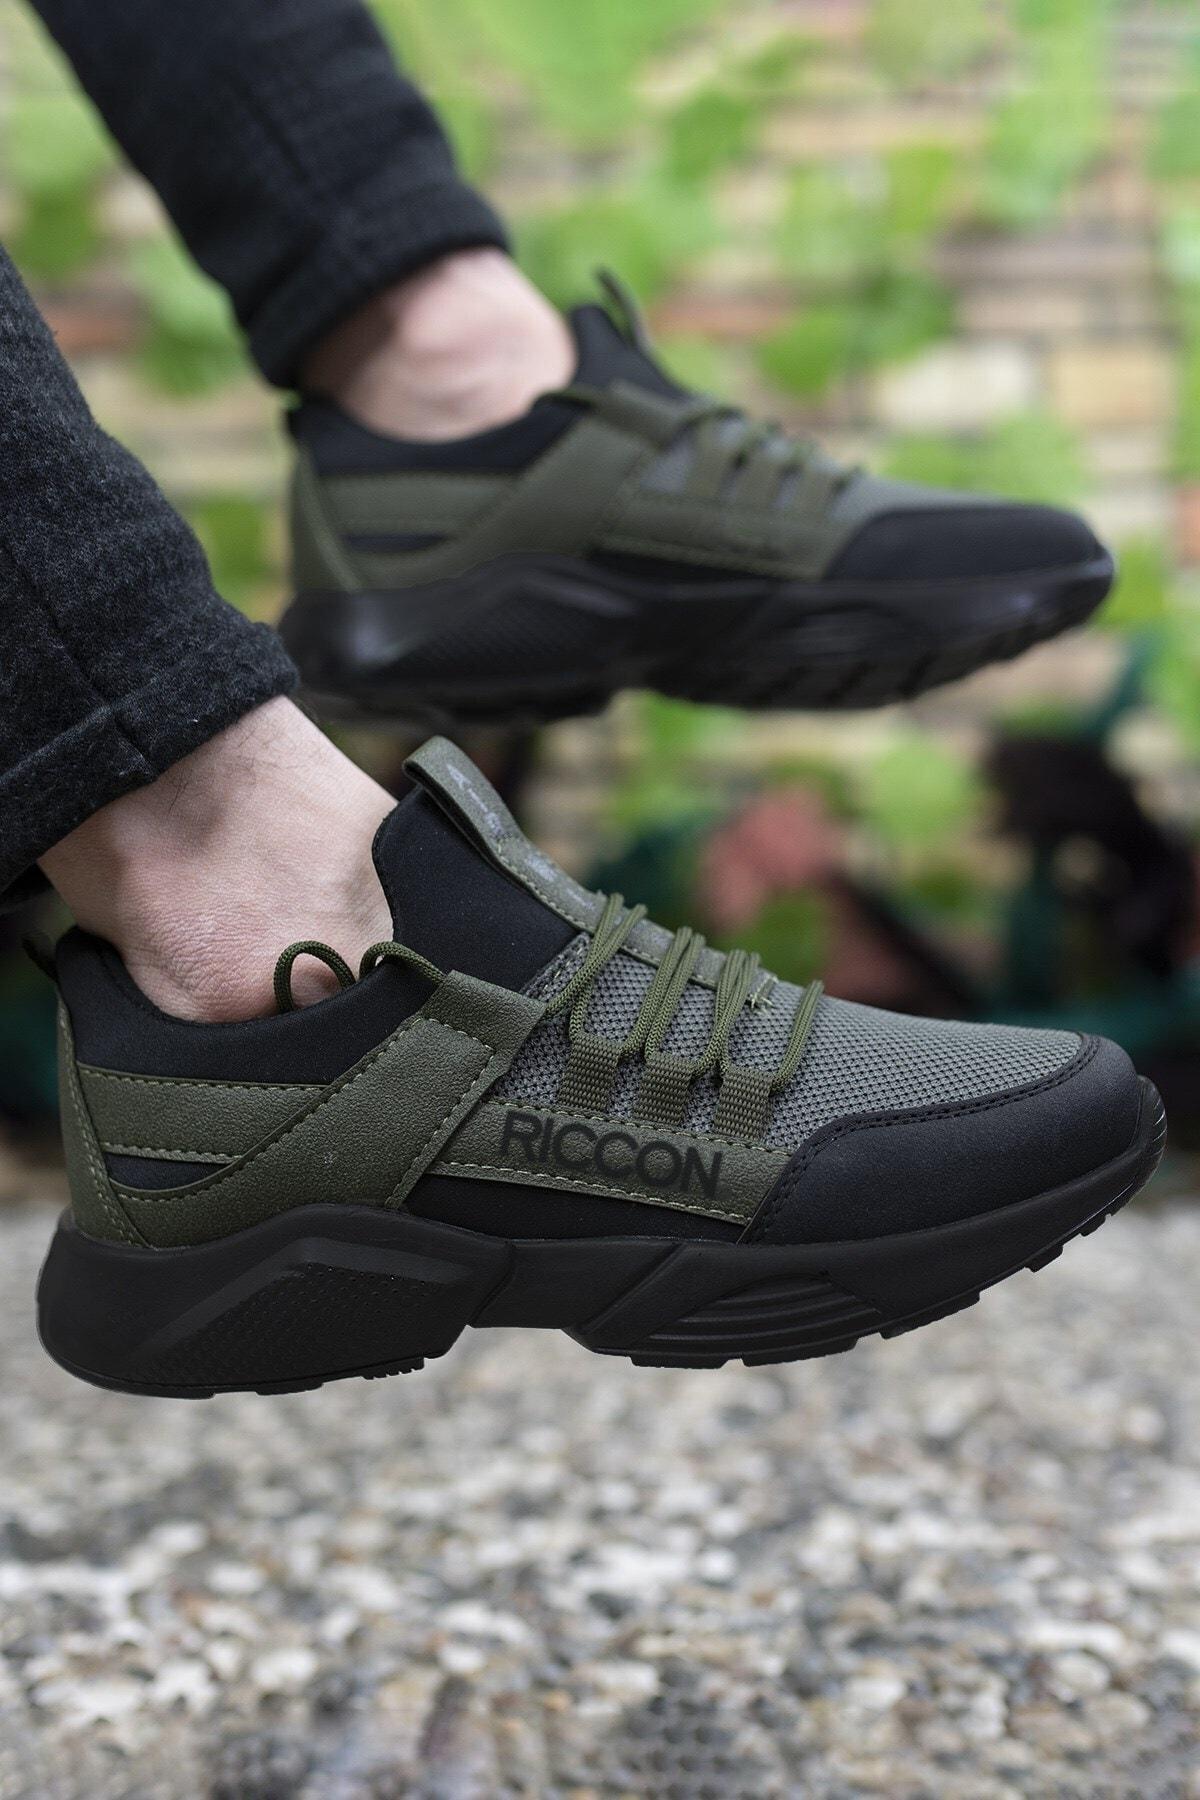 Riccon Unisex Haki Siyah Sneaker 0012072 1